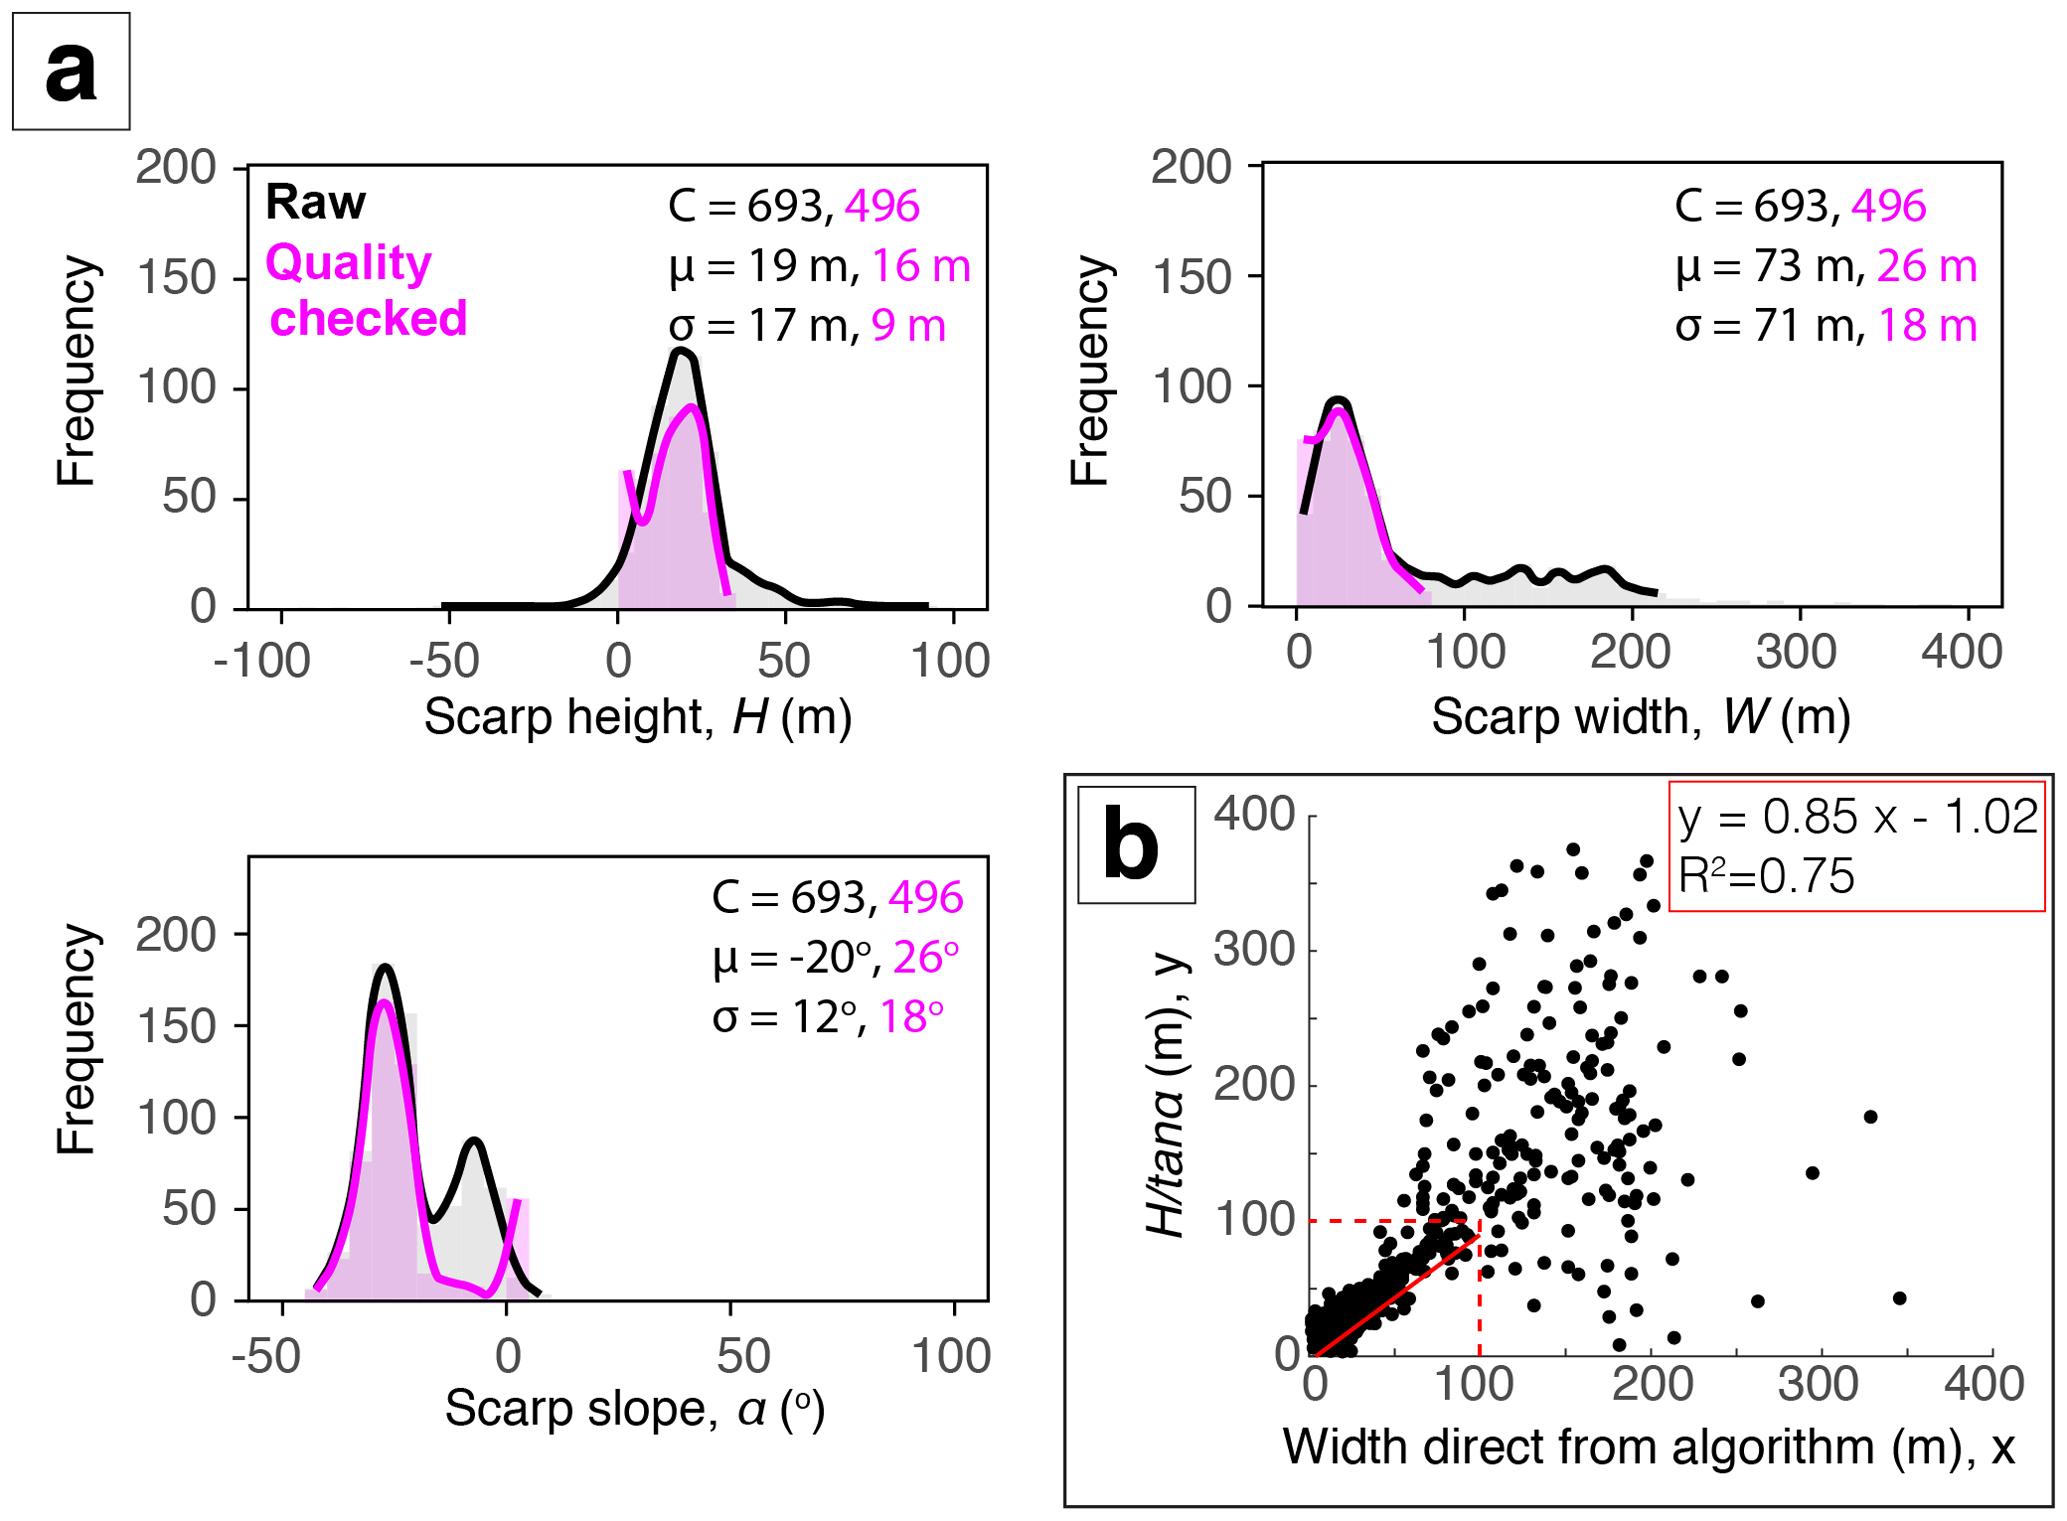 SE - A semi-automated algorithm to quantify scarp morphology (SPARTA